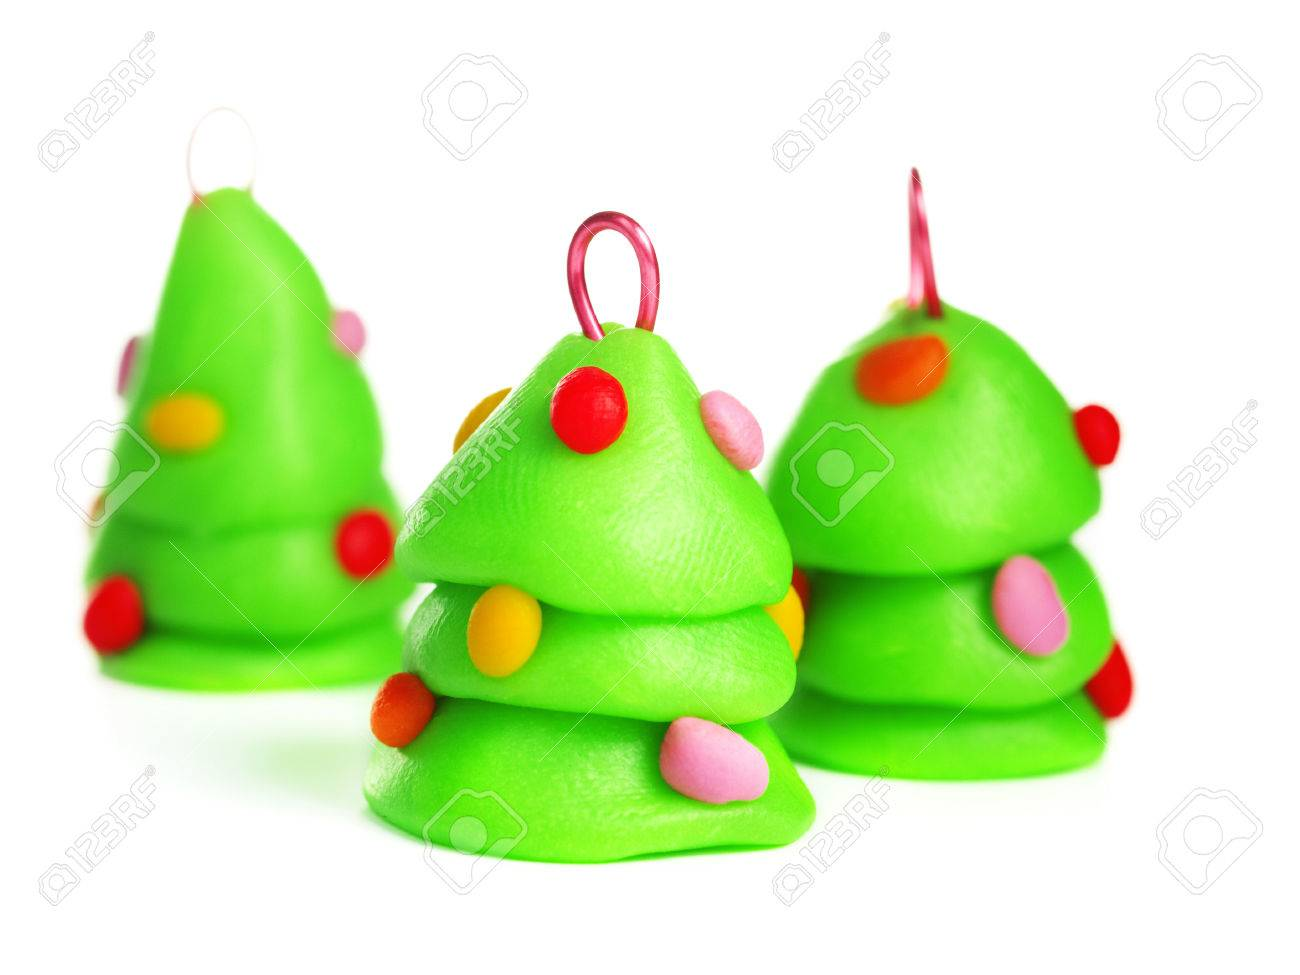 Polymer Clay Christmas Tree.Christmas Tree Handmade Decoration Isolated On White Made